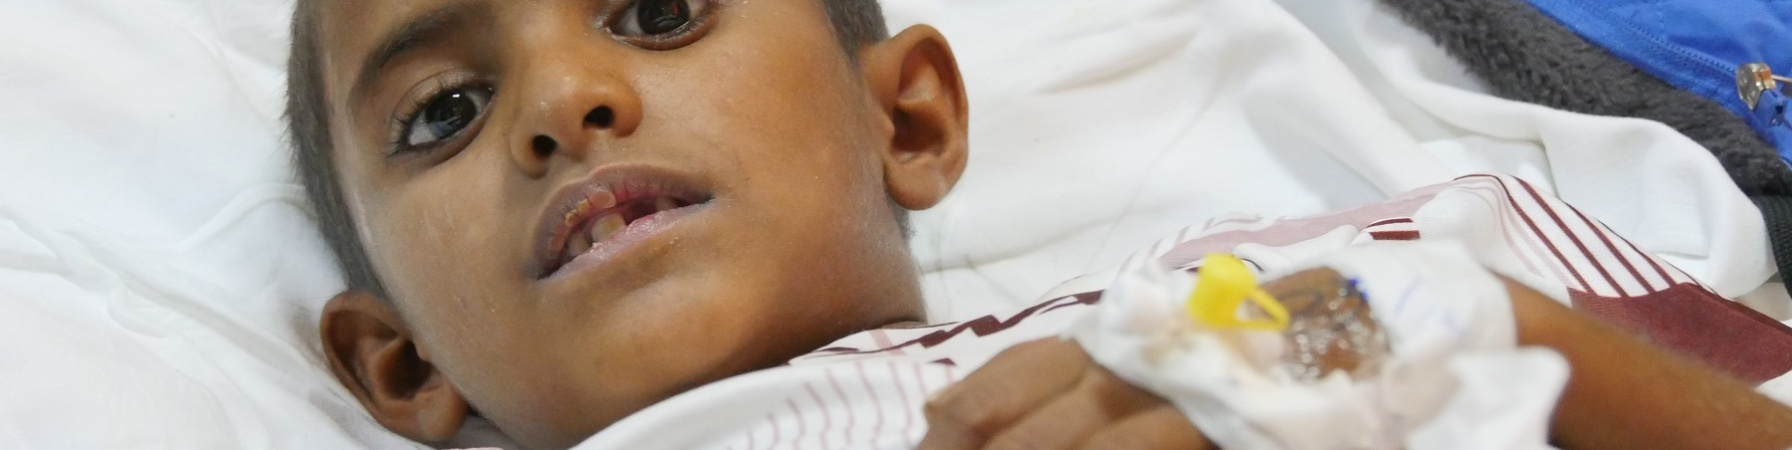 bambino-yemenita-sdraiato-in-letto-ospedale